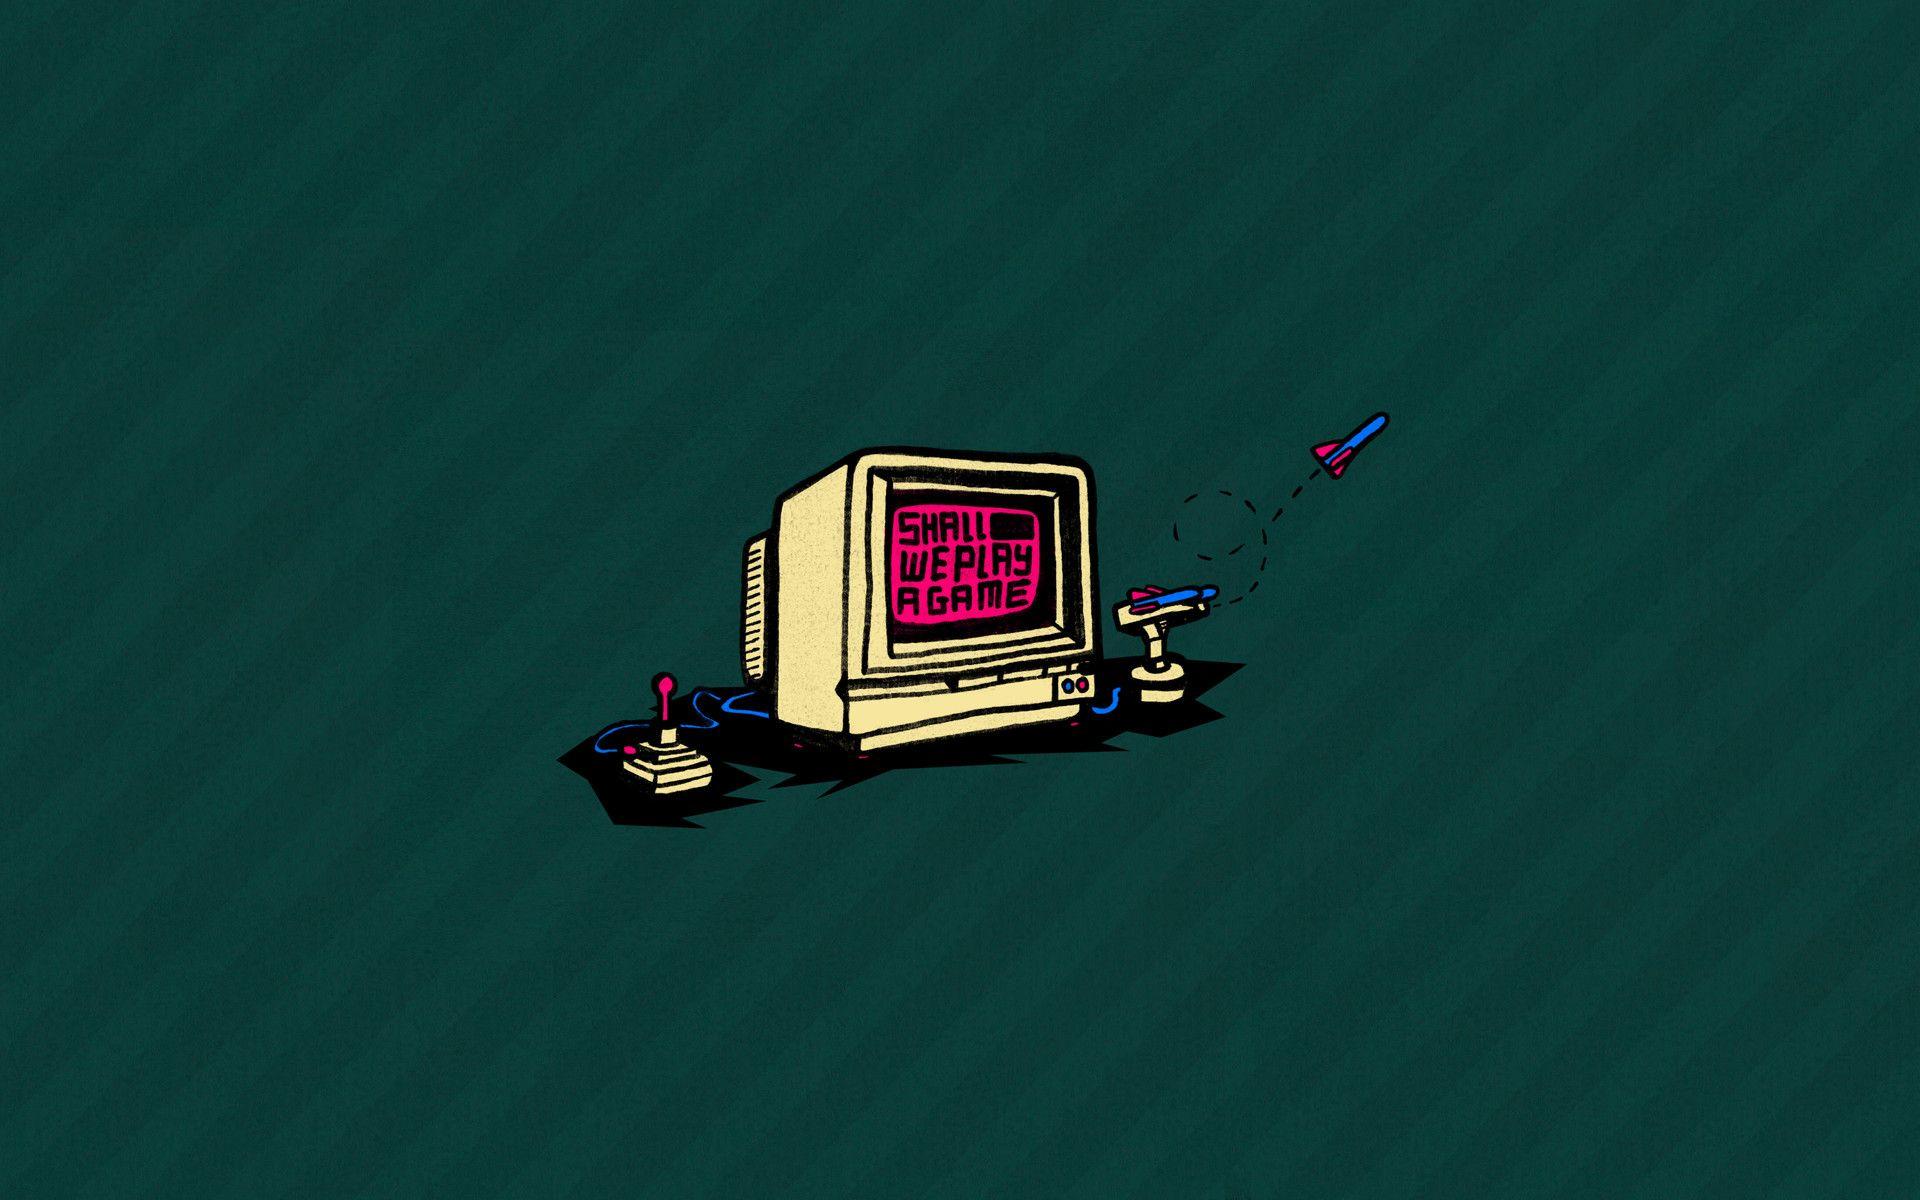 1920x1200 Retro Game Images For Desktop Wallpaper 1920 x 1200 px 1920x1200